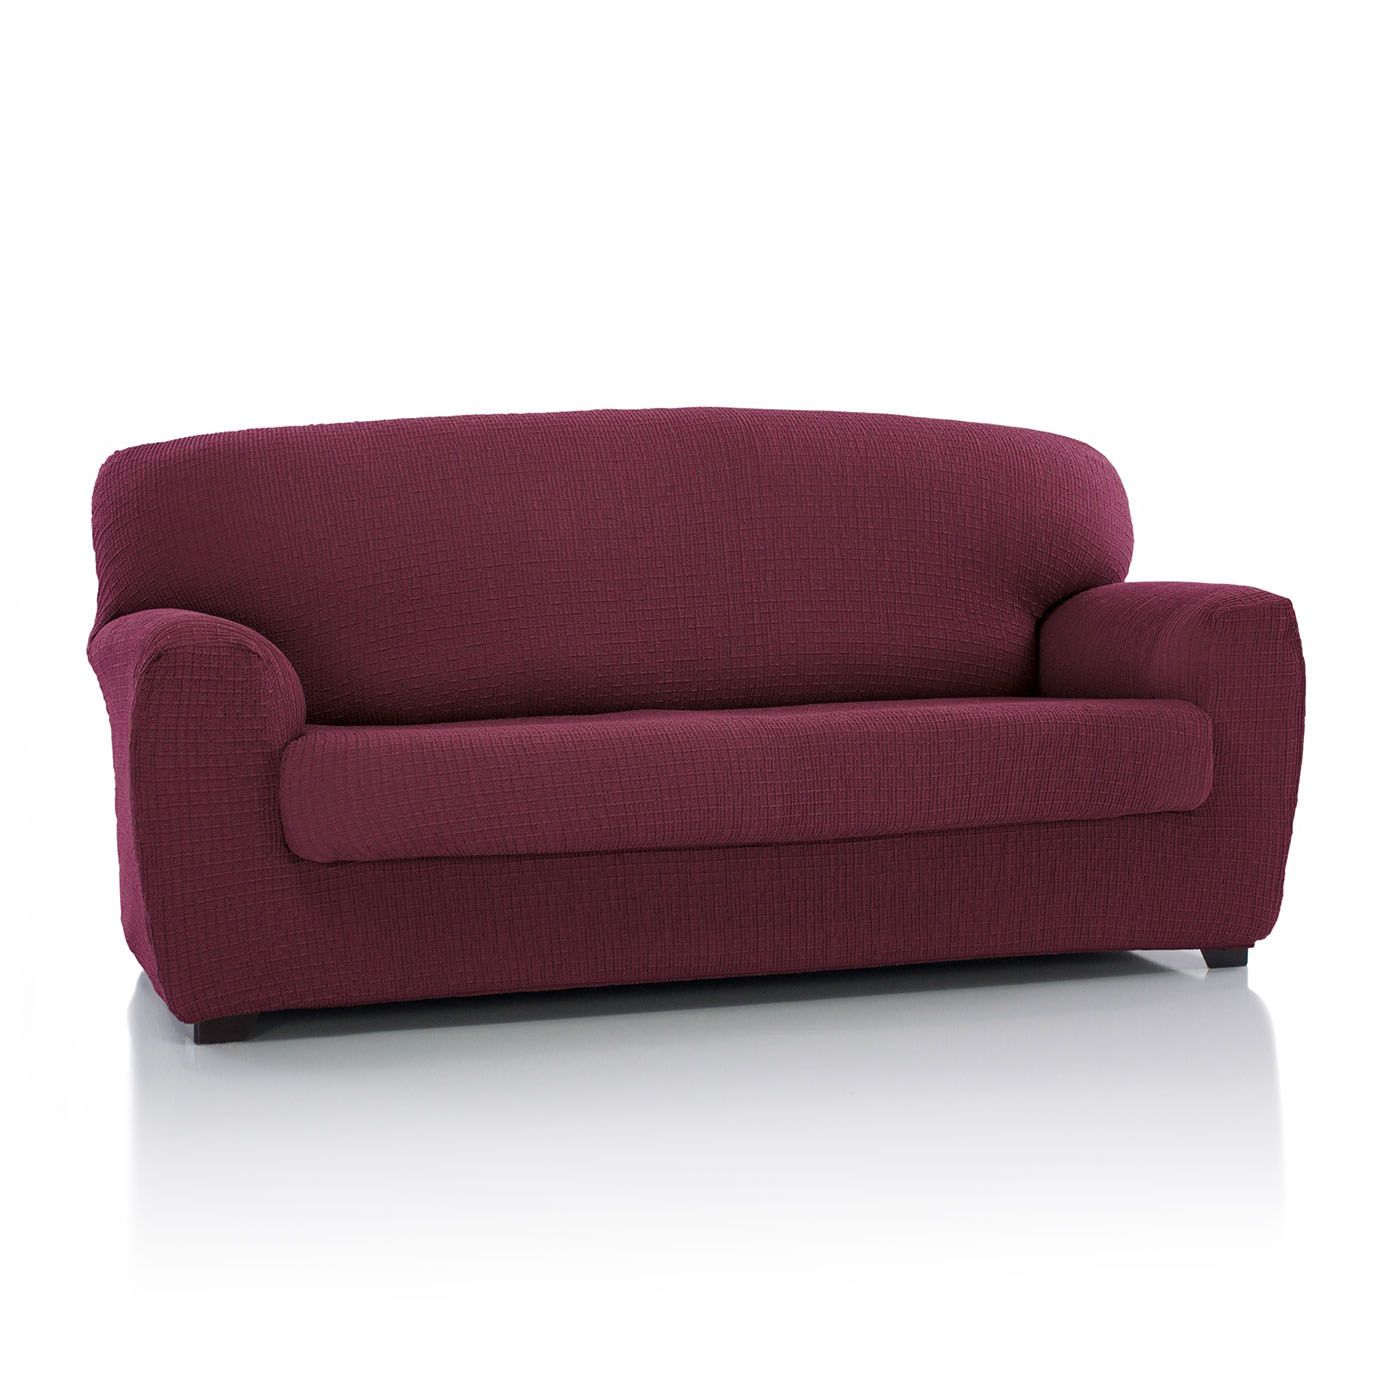 Full Size of Sofa Bezug Le Corbusier Verkaufen Mit Verstellbarer Sitztiefe Rotes Rundes Antik Angebote Cassina Halbrundes W Schillig Natura Tom Tailor Comfortmaster Groß Sofa Sofa Bezug